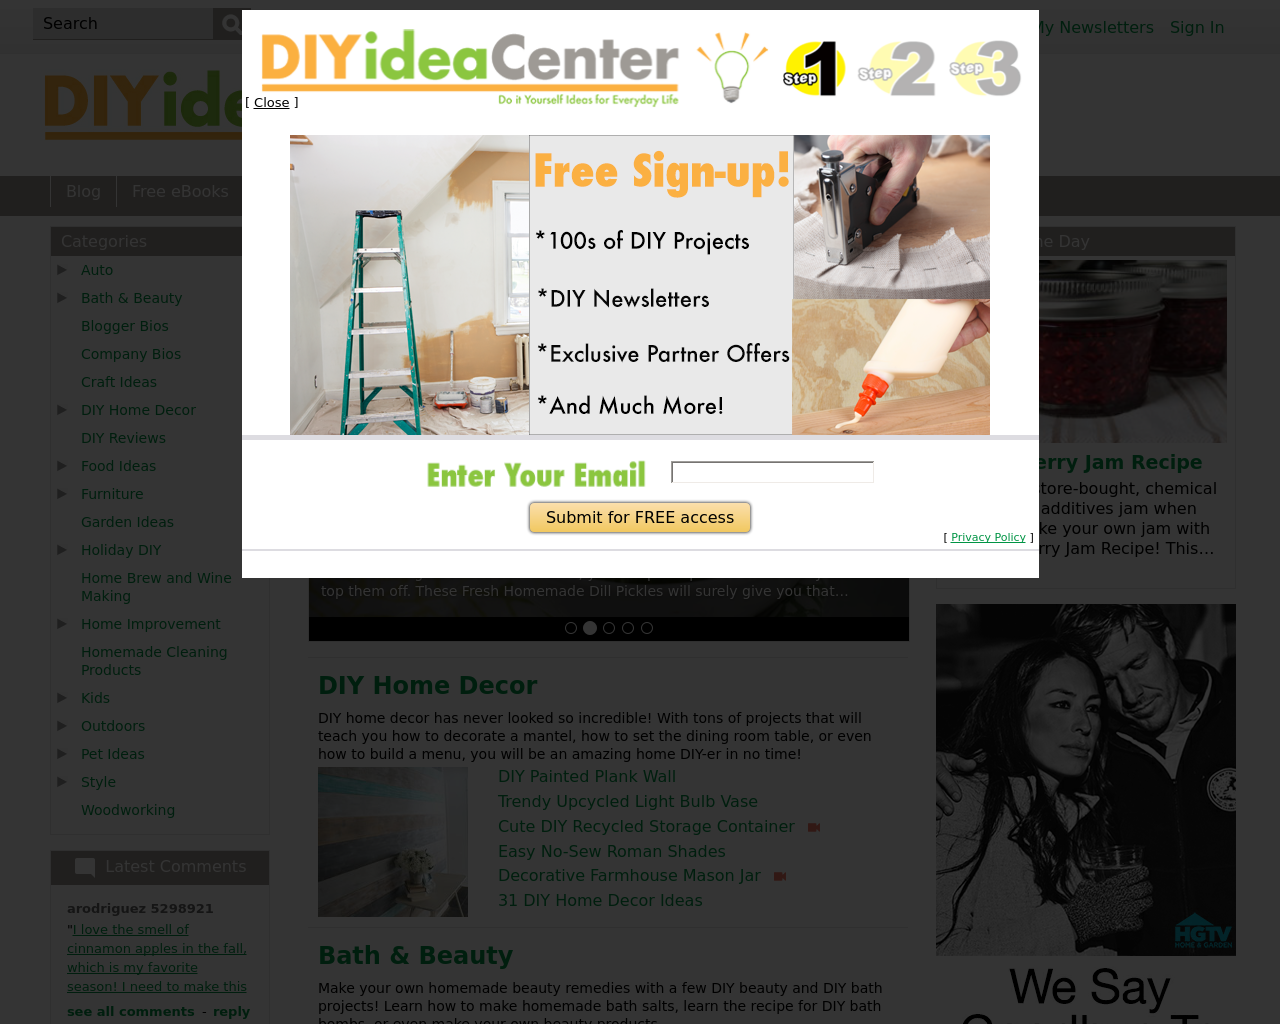 DIYideaCenter.com-Advertising-Reviews-Pricing